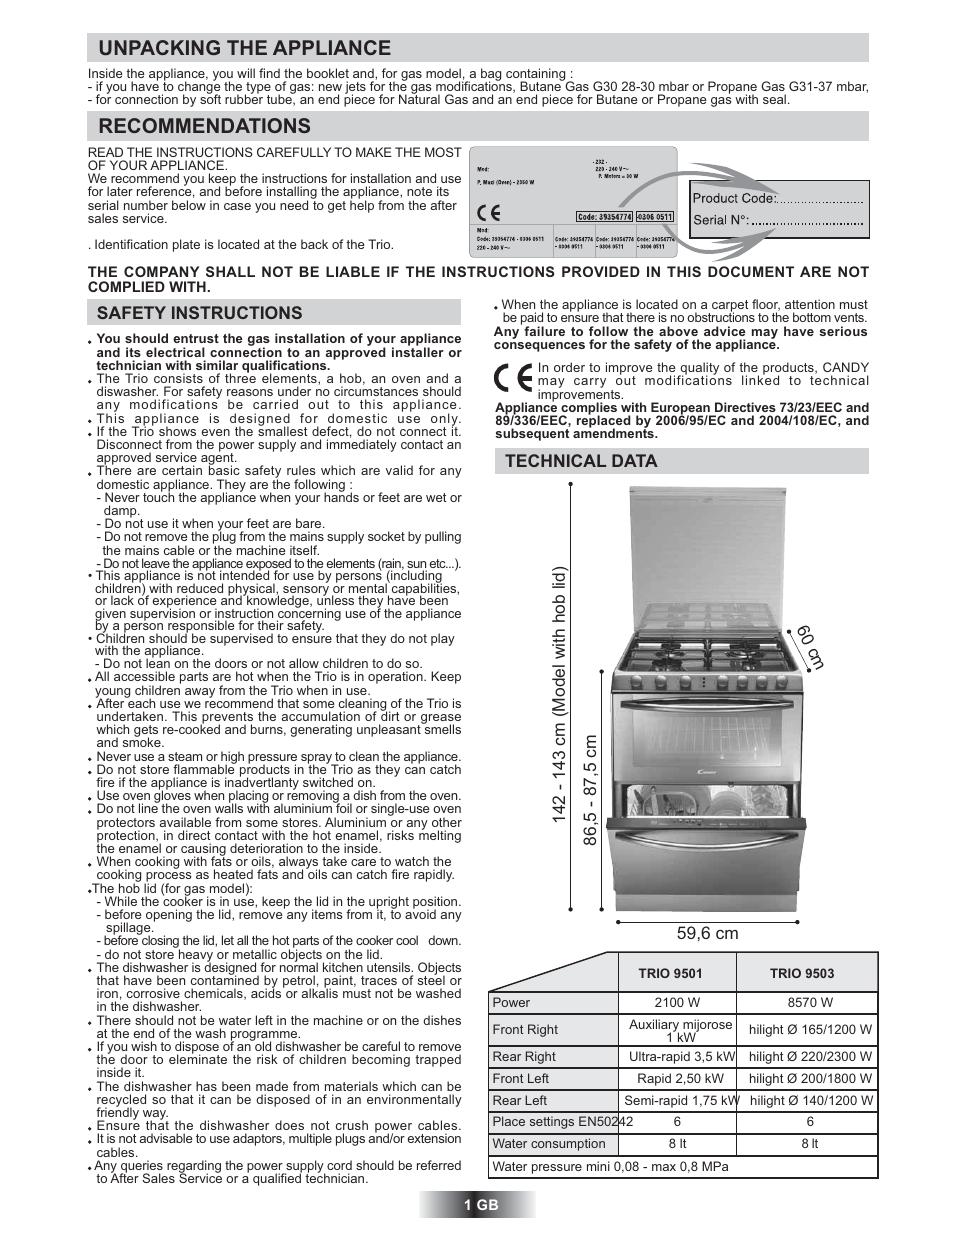 unpacking the appliance recommendations candy trio 9503 x user rh manualsdir com Bosch Appliances Roper Appliances